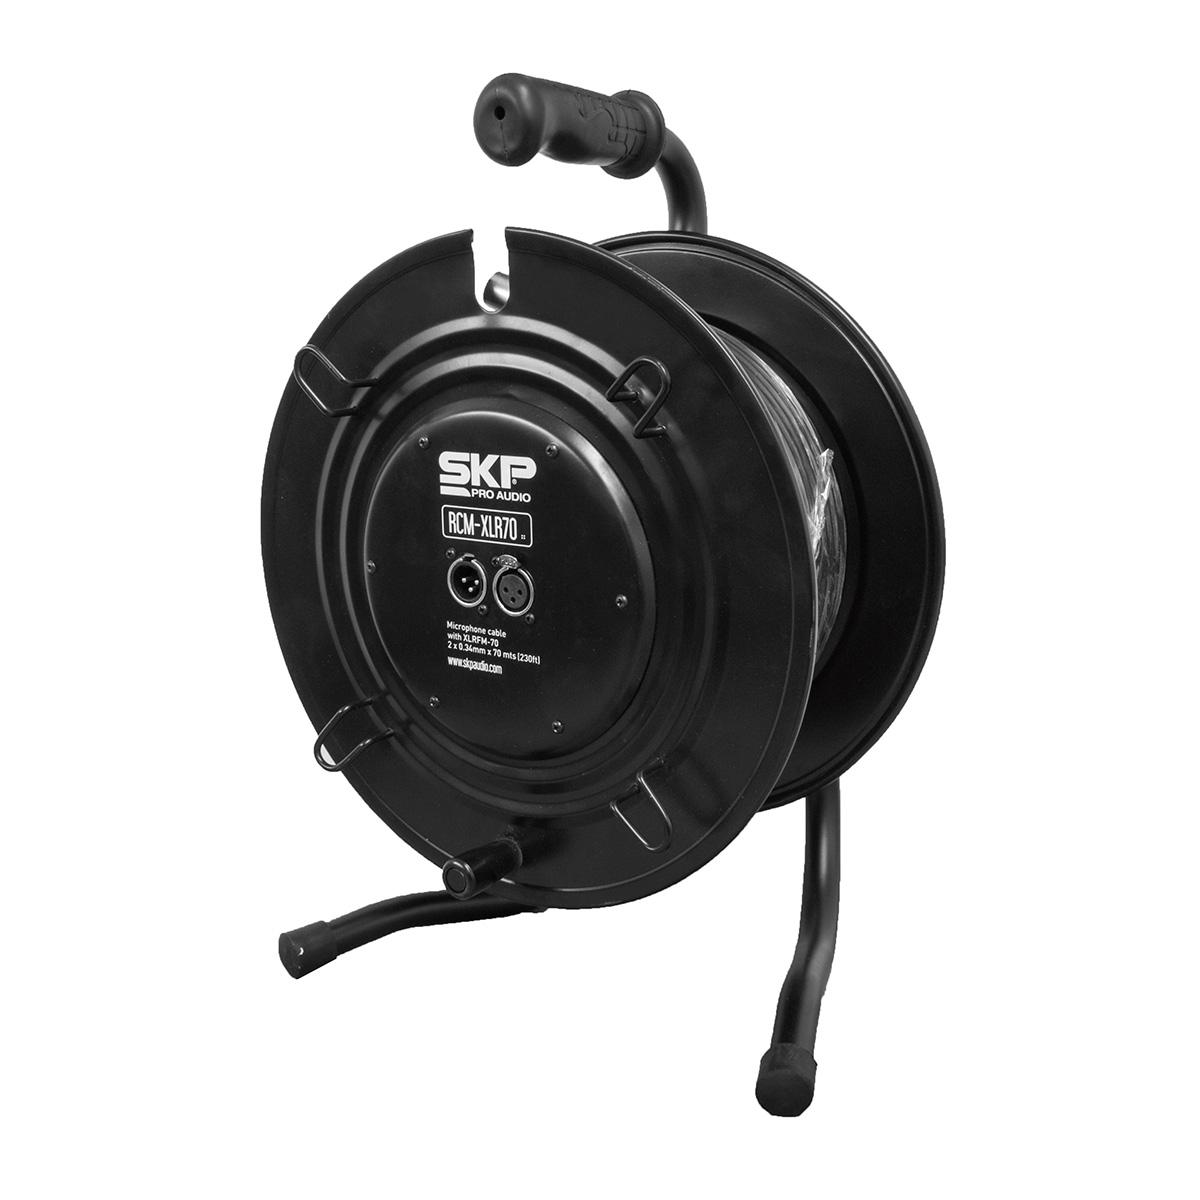 RCMXLR70 - Extensor de Cabo p/ Microfone c/ 70m RCM XLR 70 - SKP